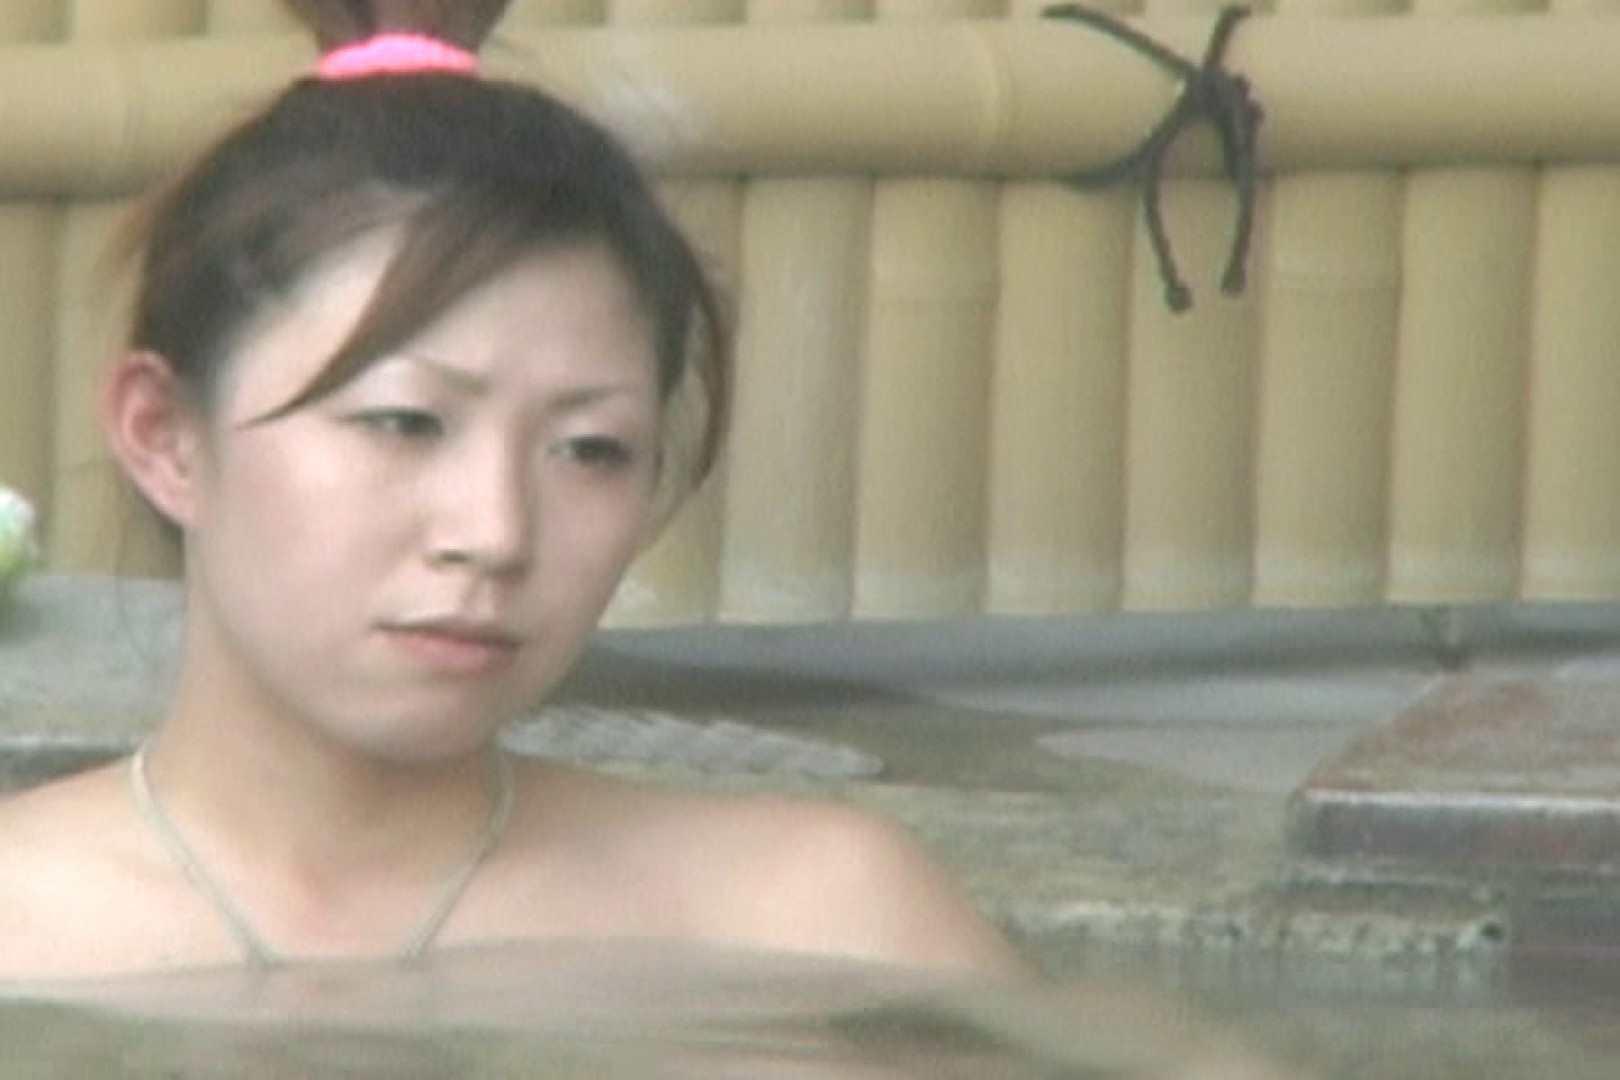 Aquaな露天風呂Vol.593 盗撮師作品 アダルト動画キャプチャ 83pic 14